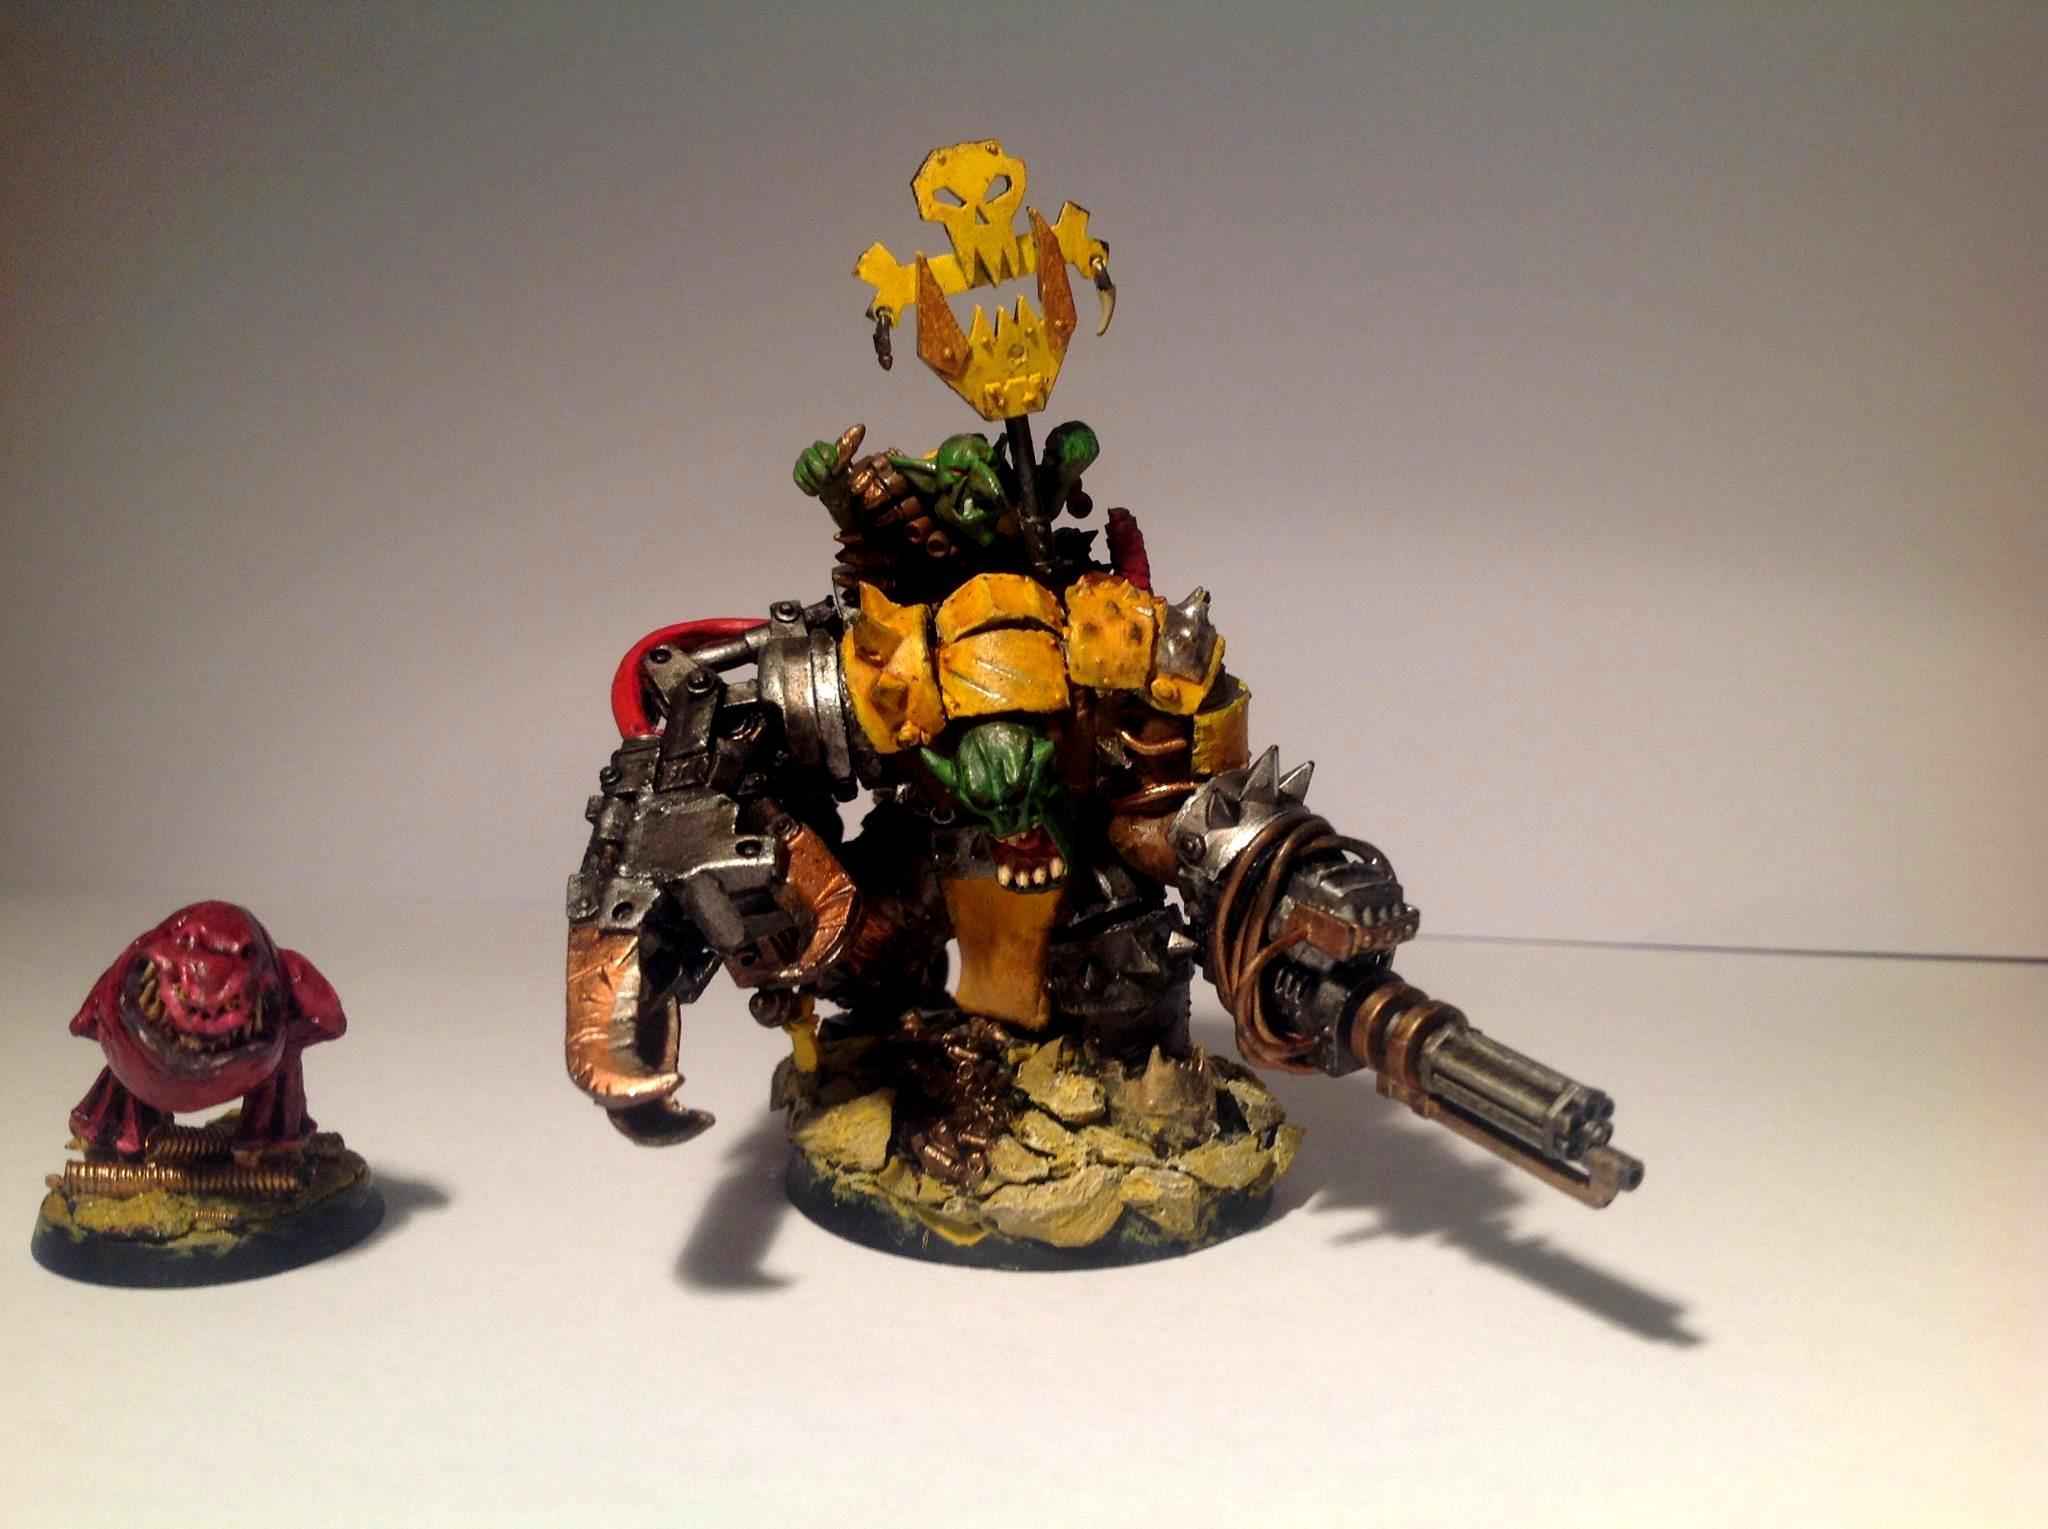 Attack Squig, Cybork, Orks, Warboss, Warhammer 40,000